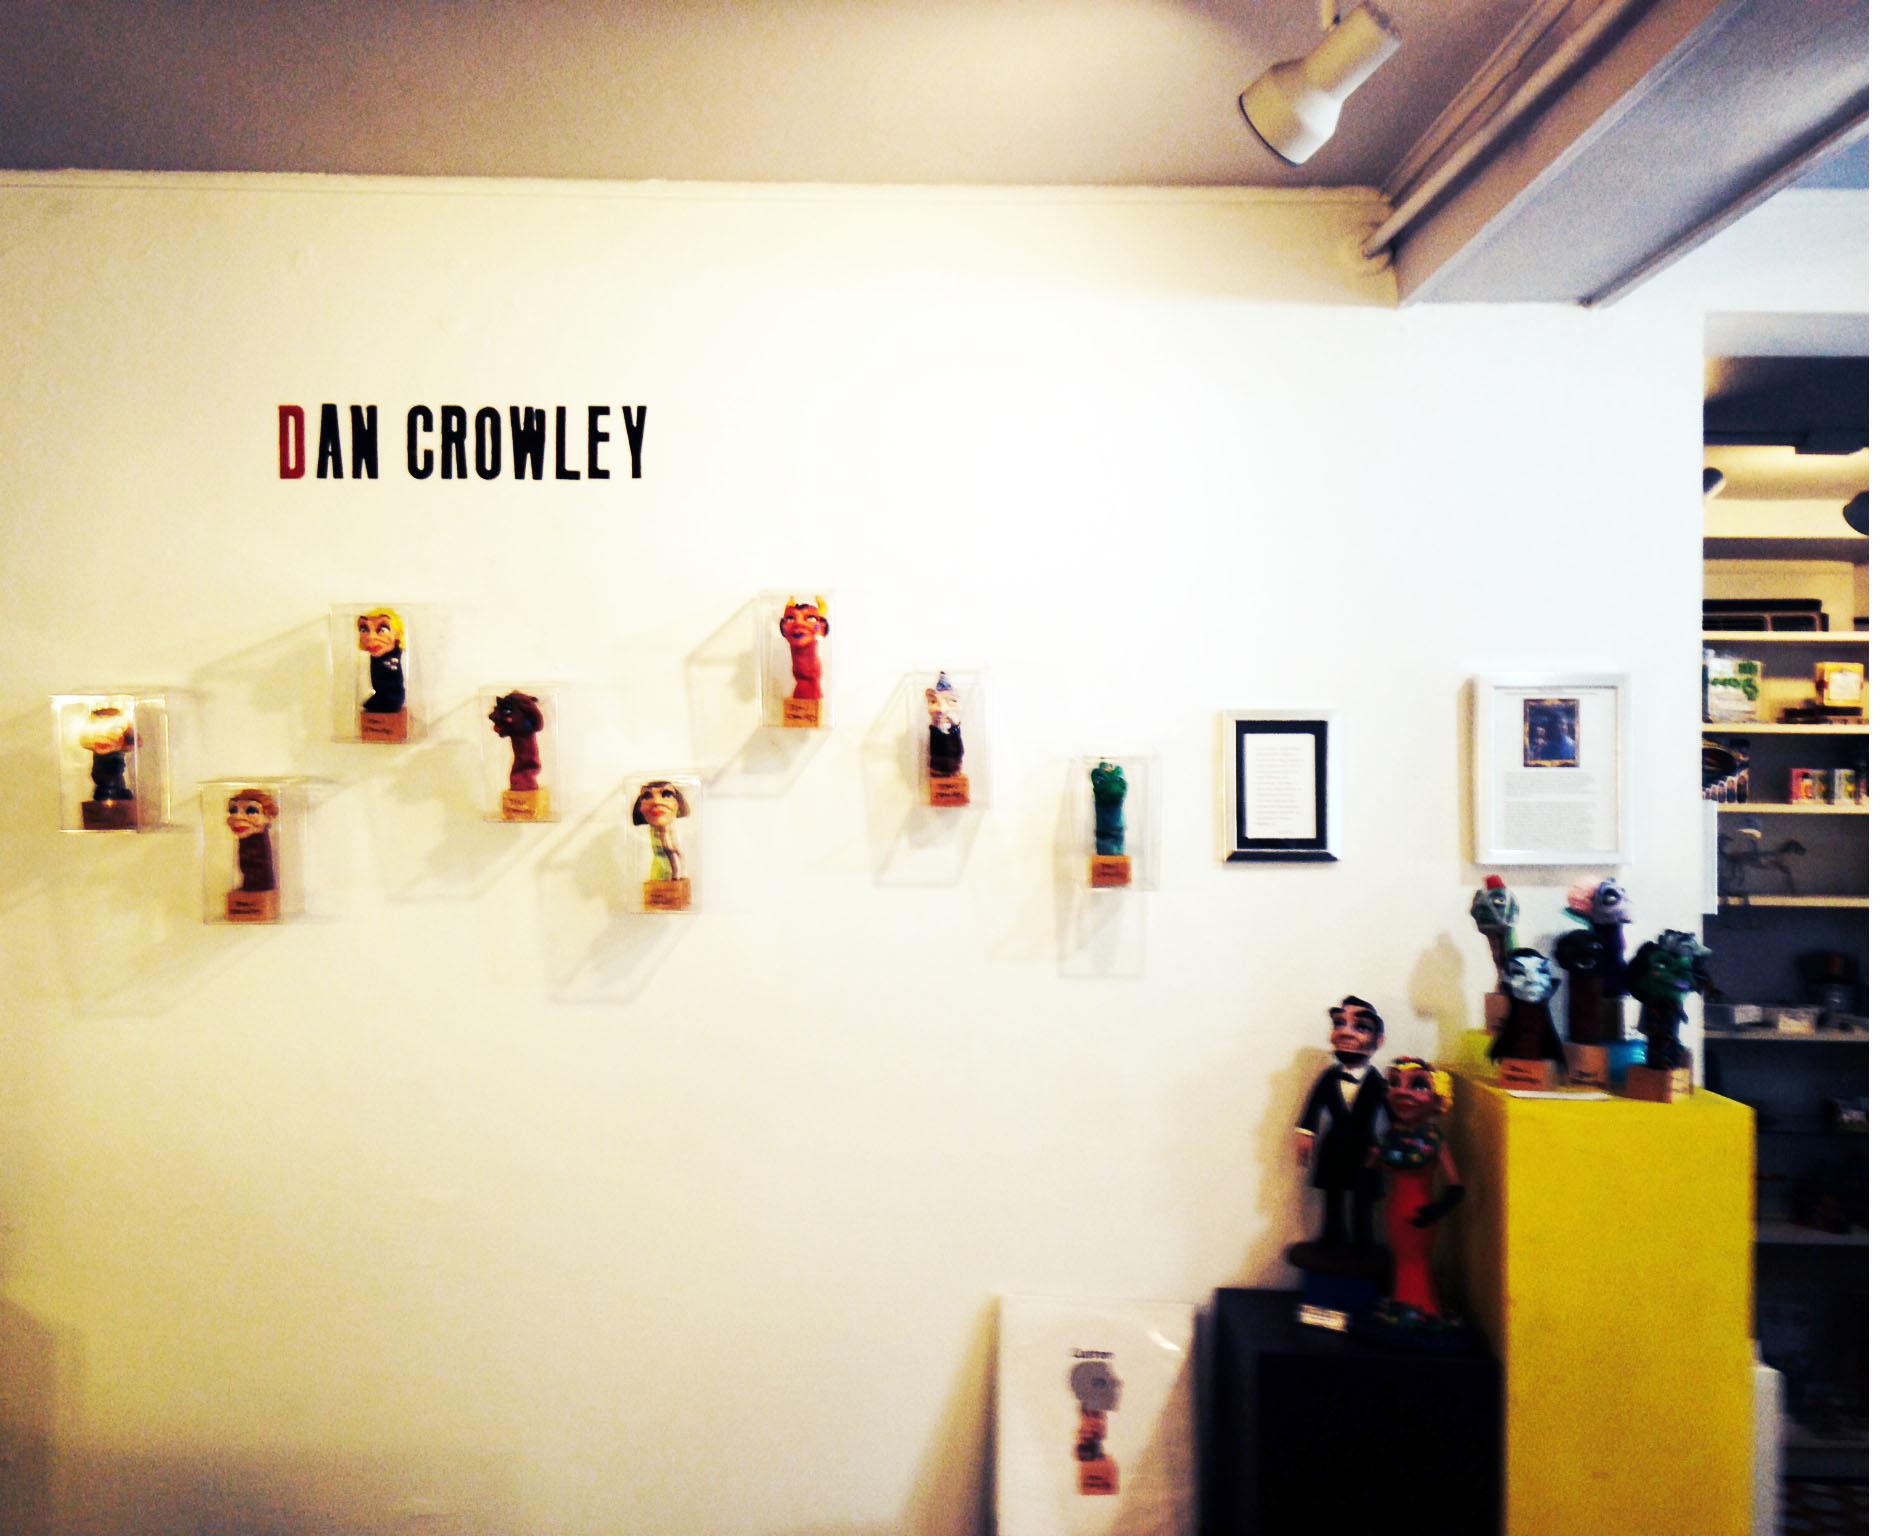 DAn Crowley Wall 9-14